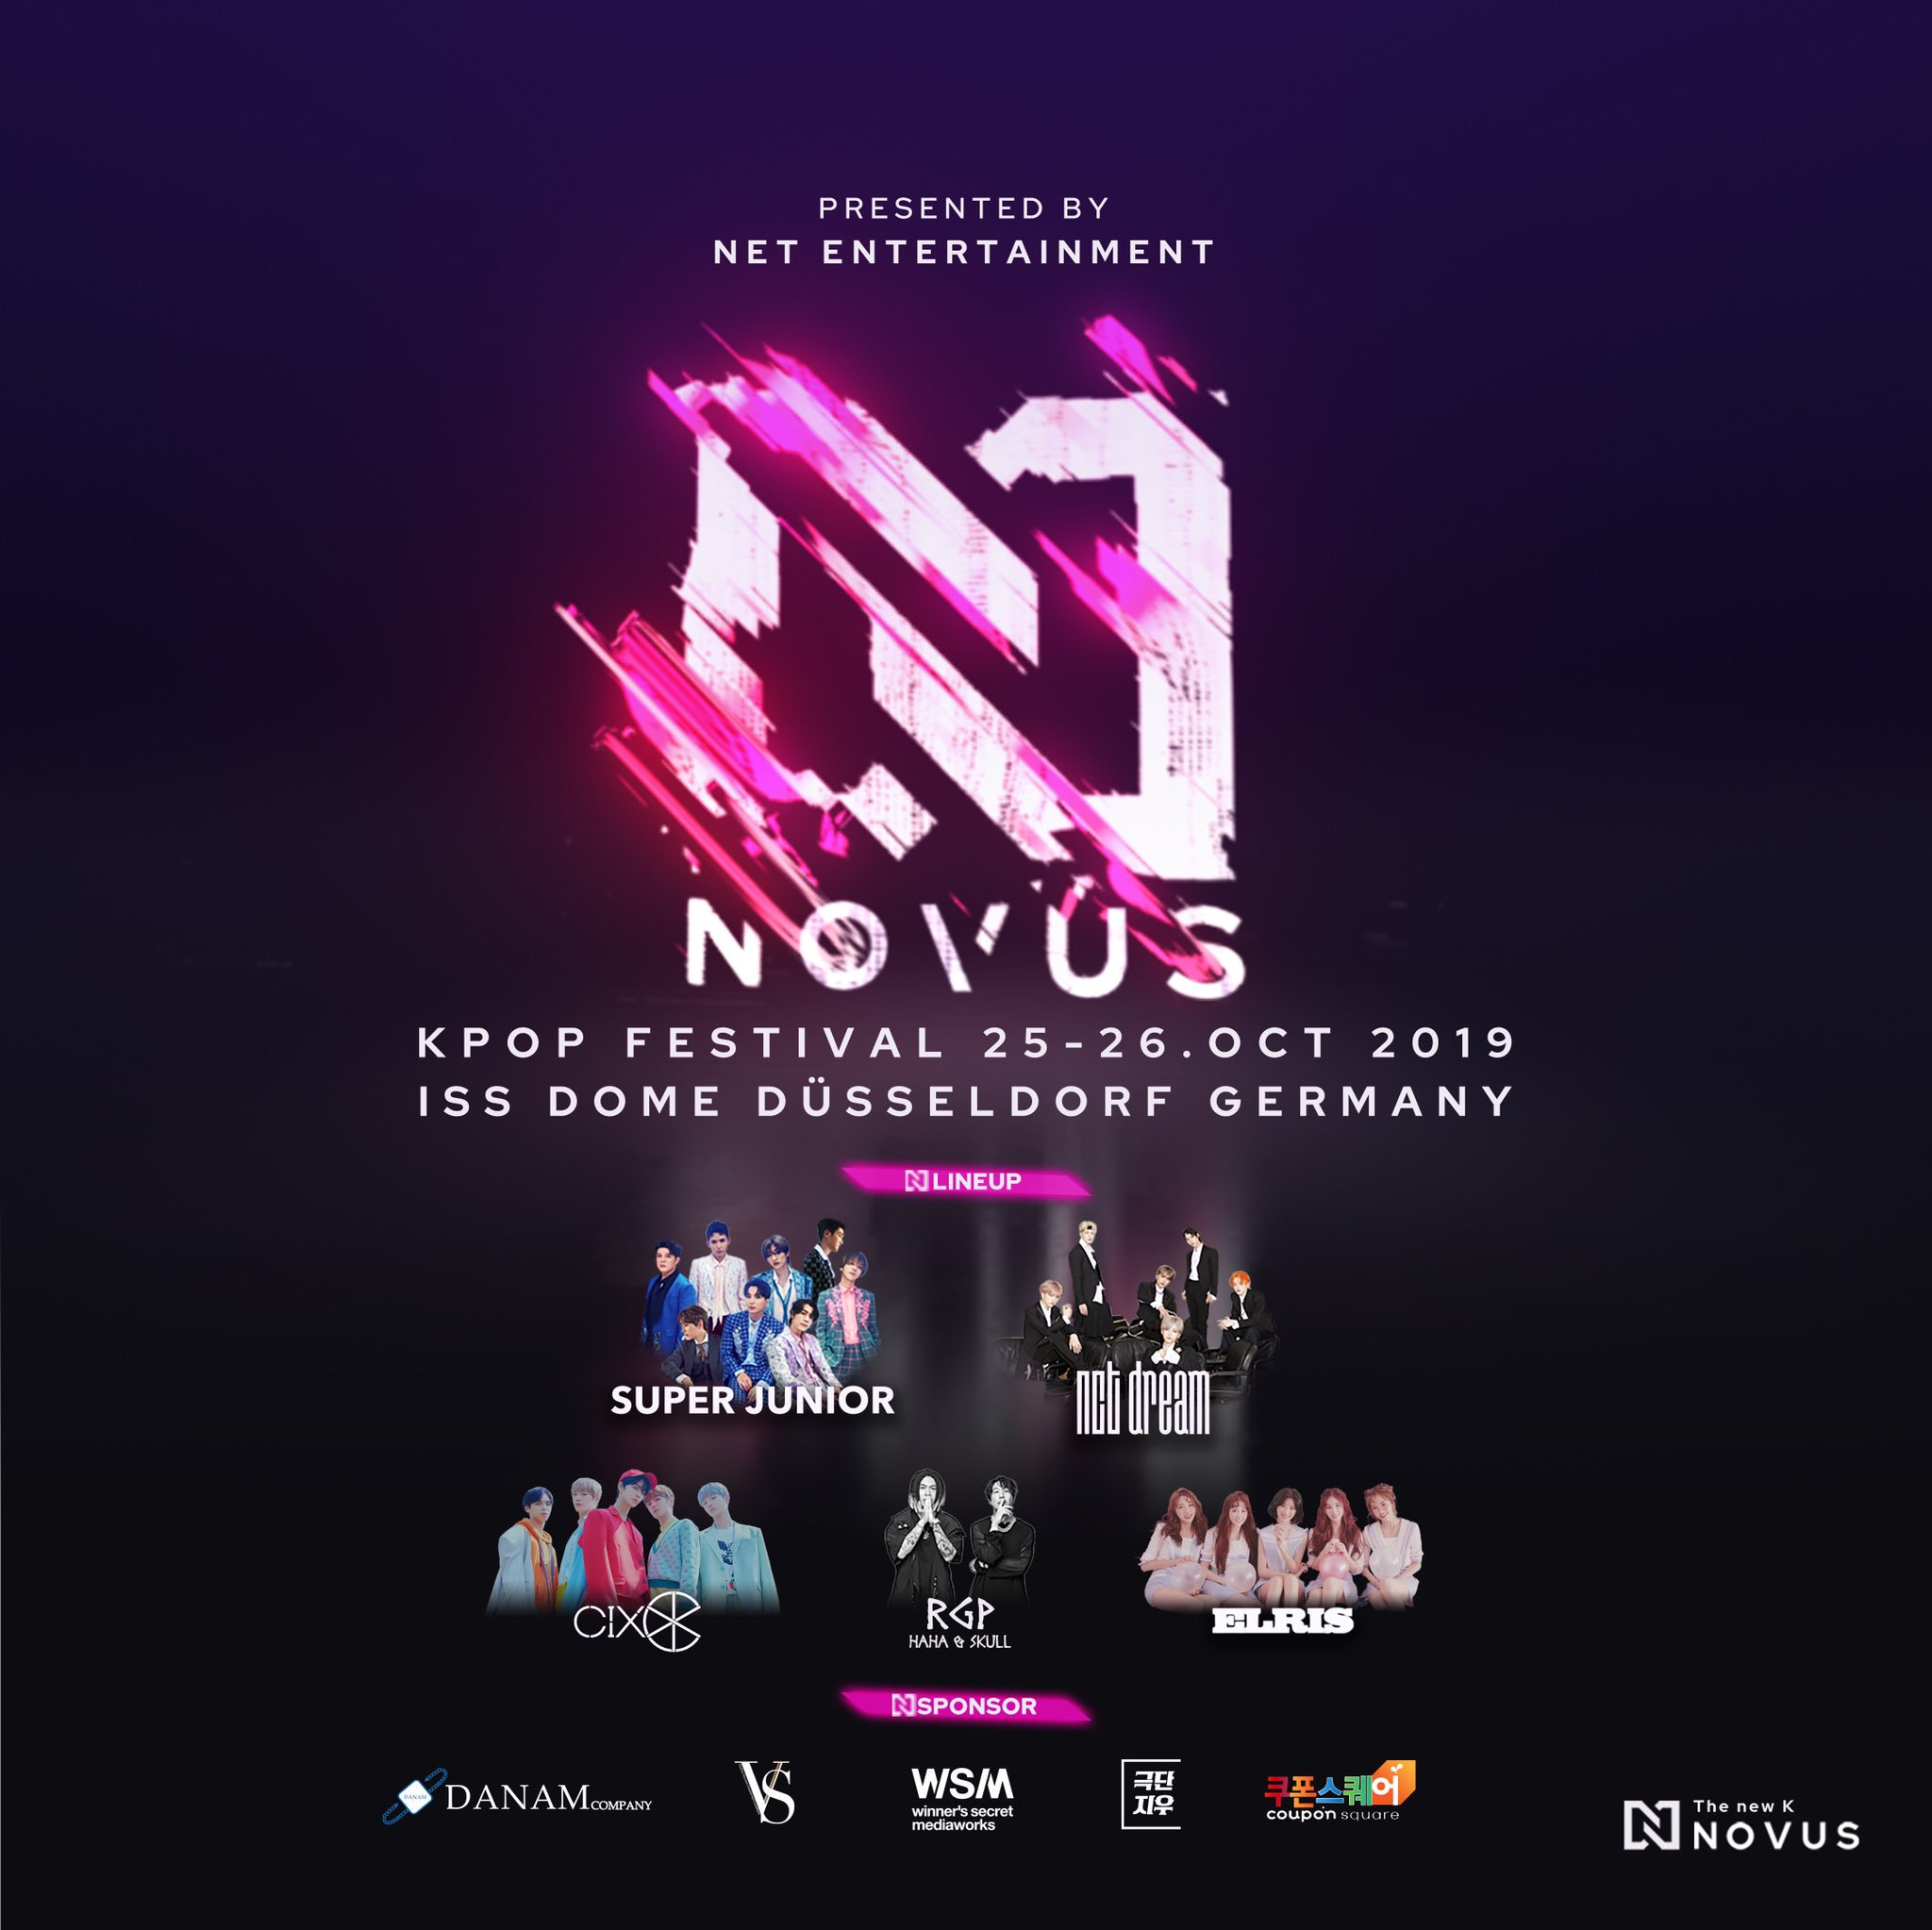 novus kpop, kpop lineup, germany, kpop concert, cix, nct dream, super junior, elris, haha, skull